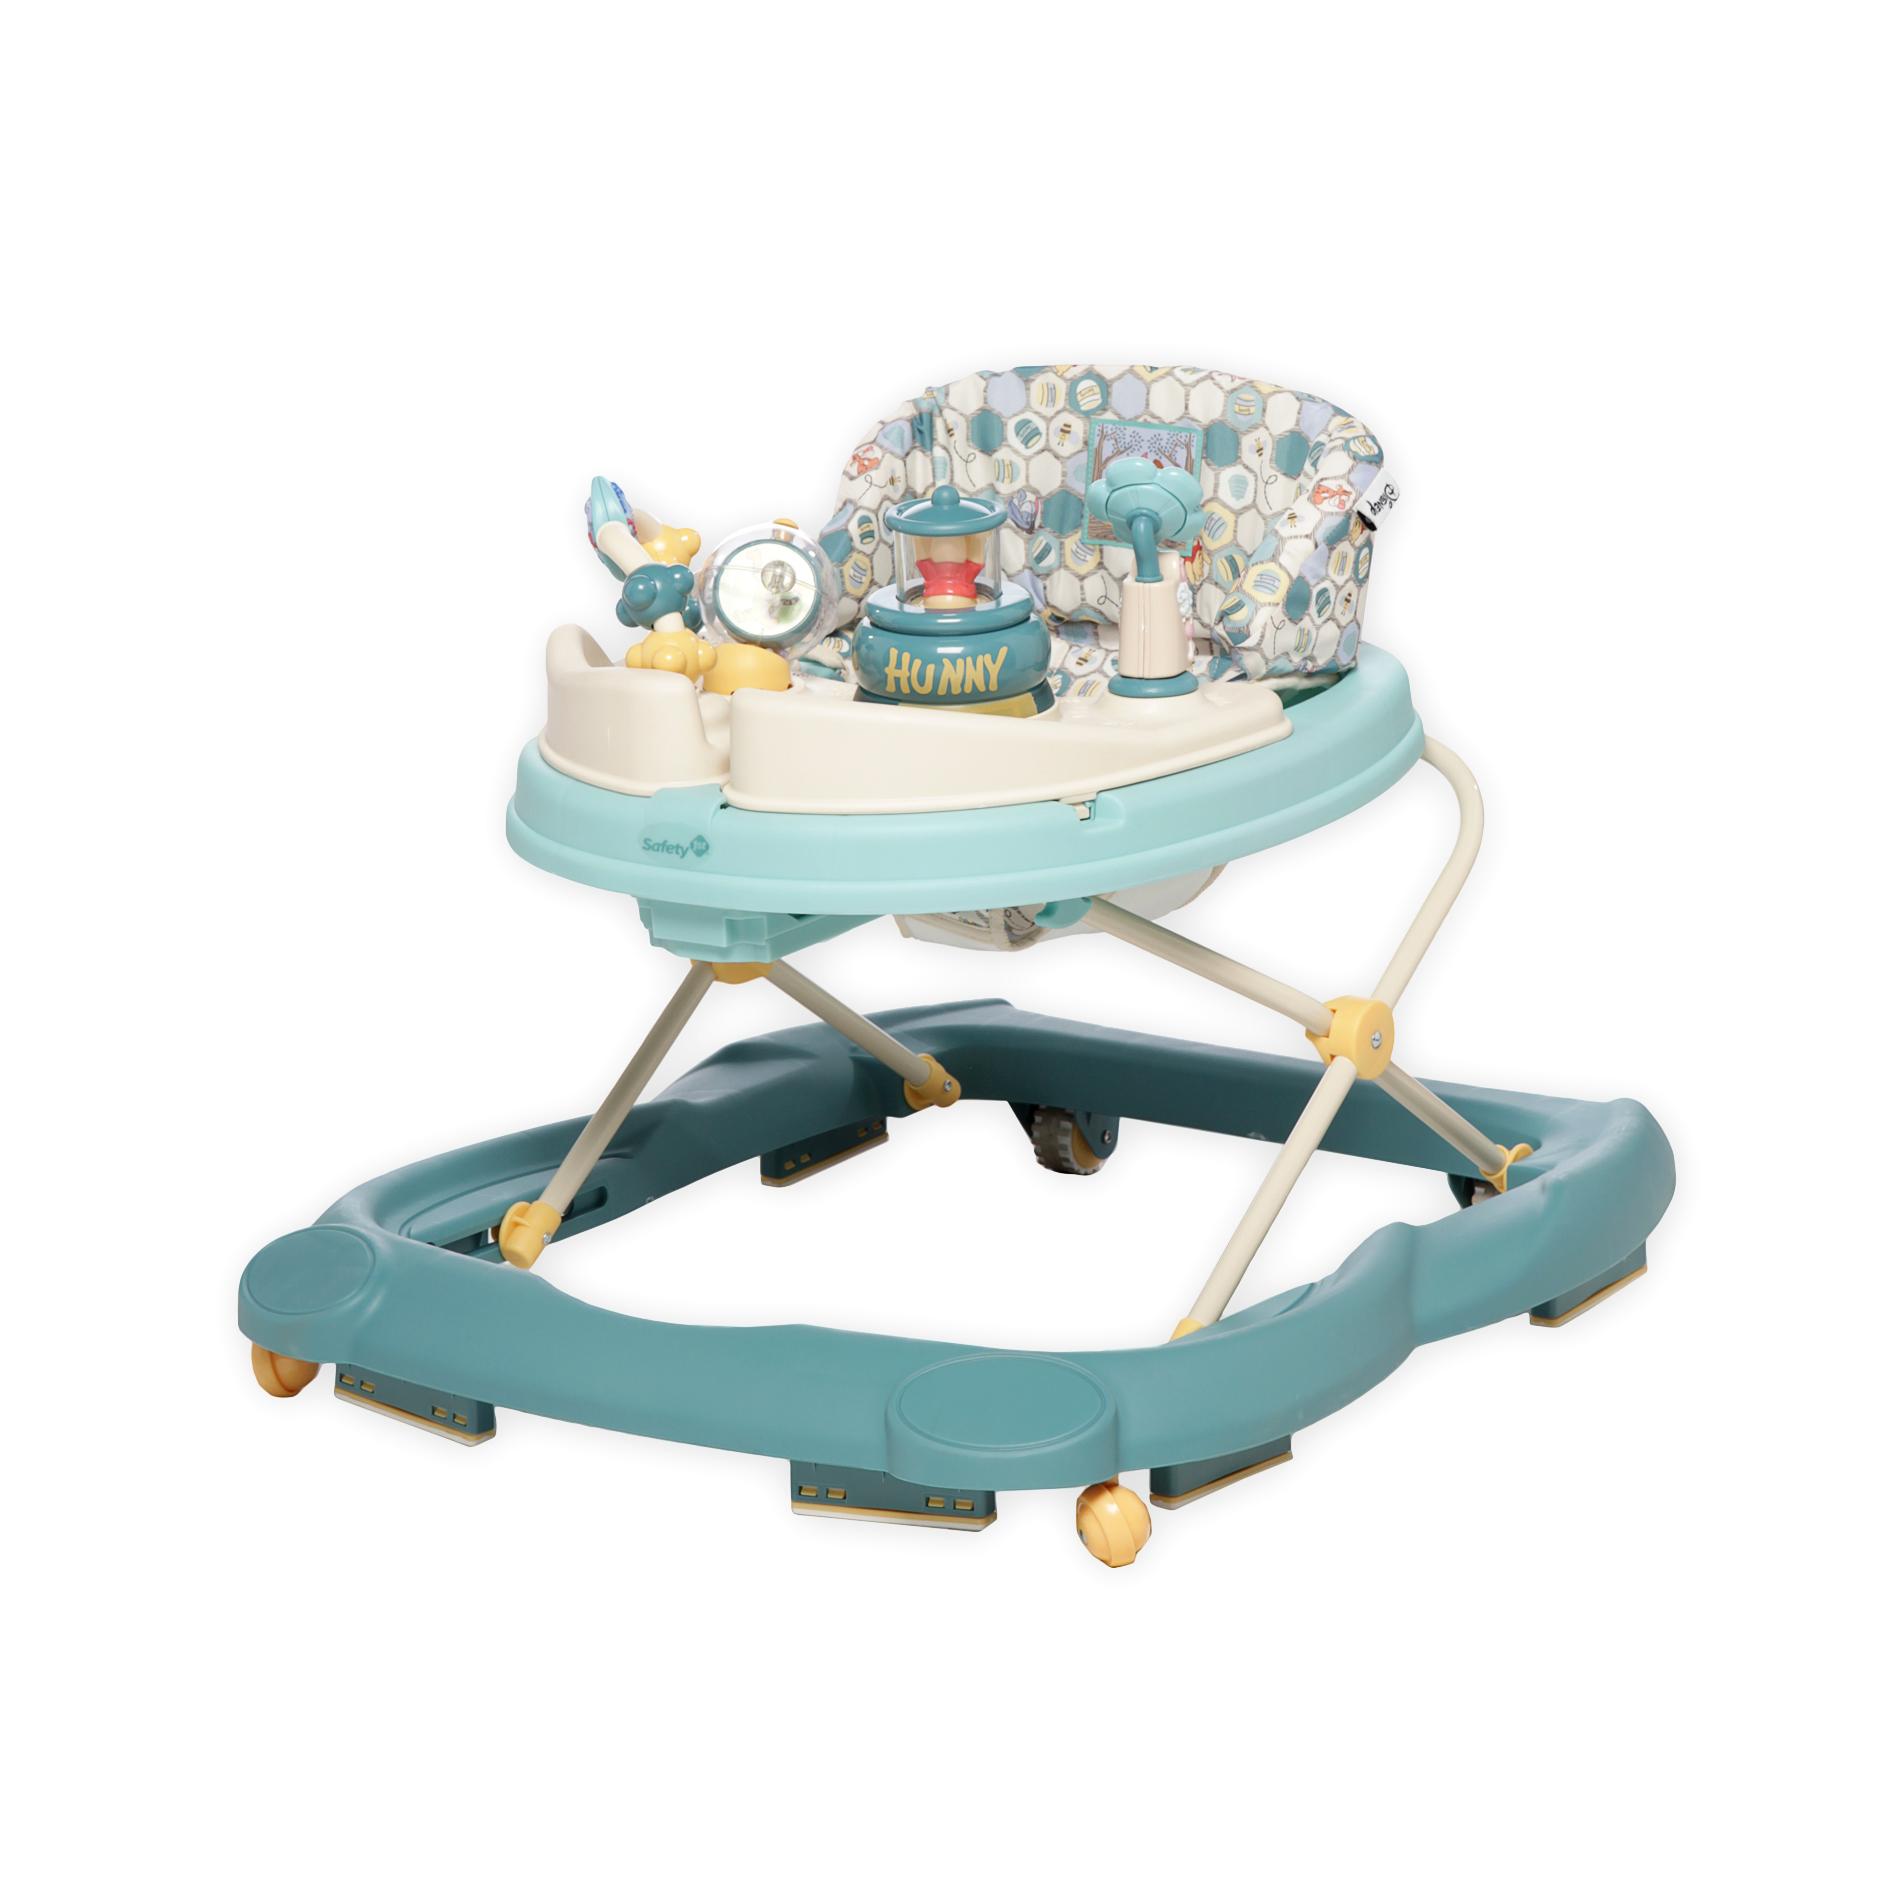 dorel juvenile group high chair desk uae upc 884392582371 disney baby music and lights